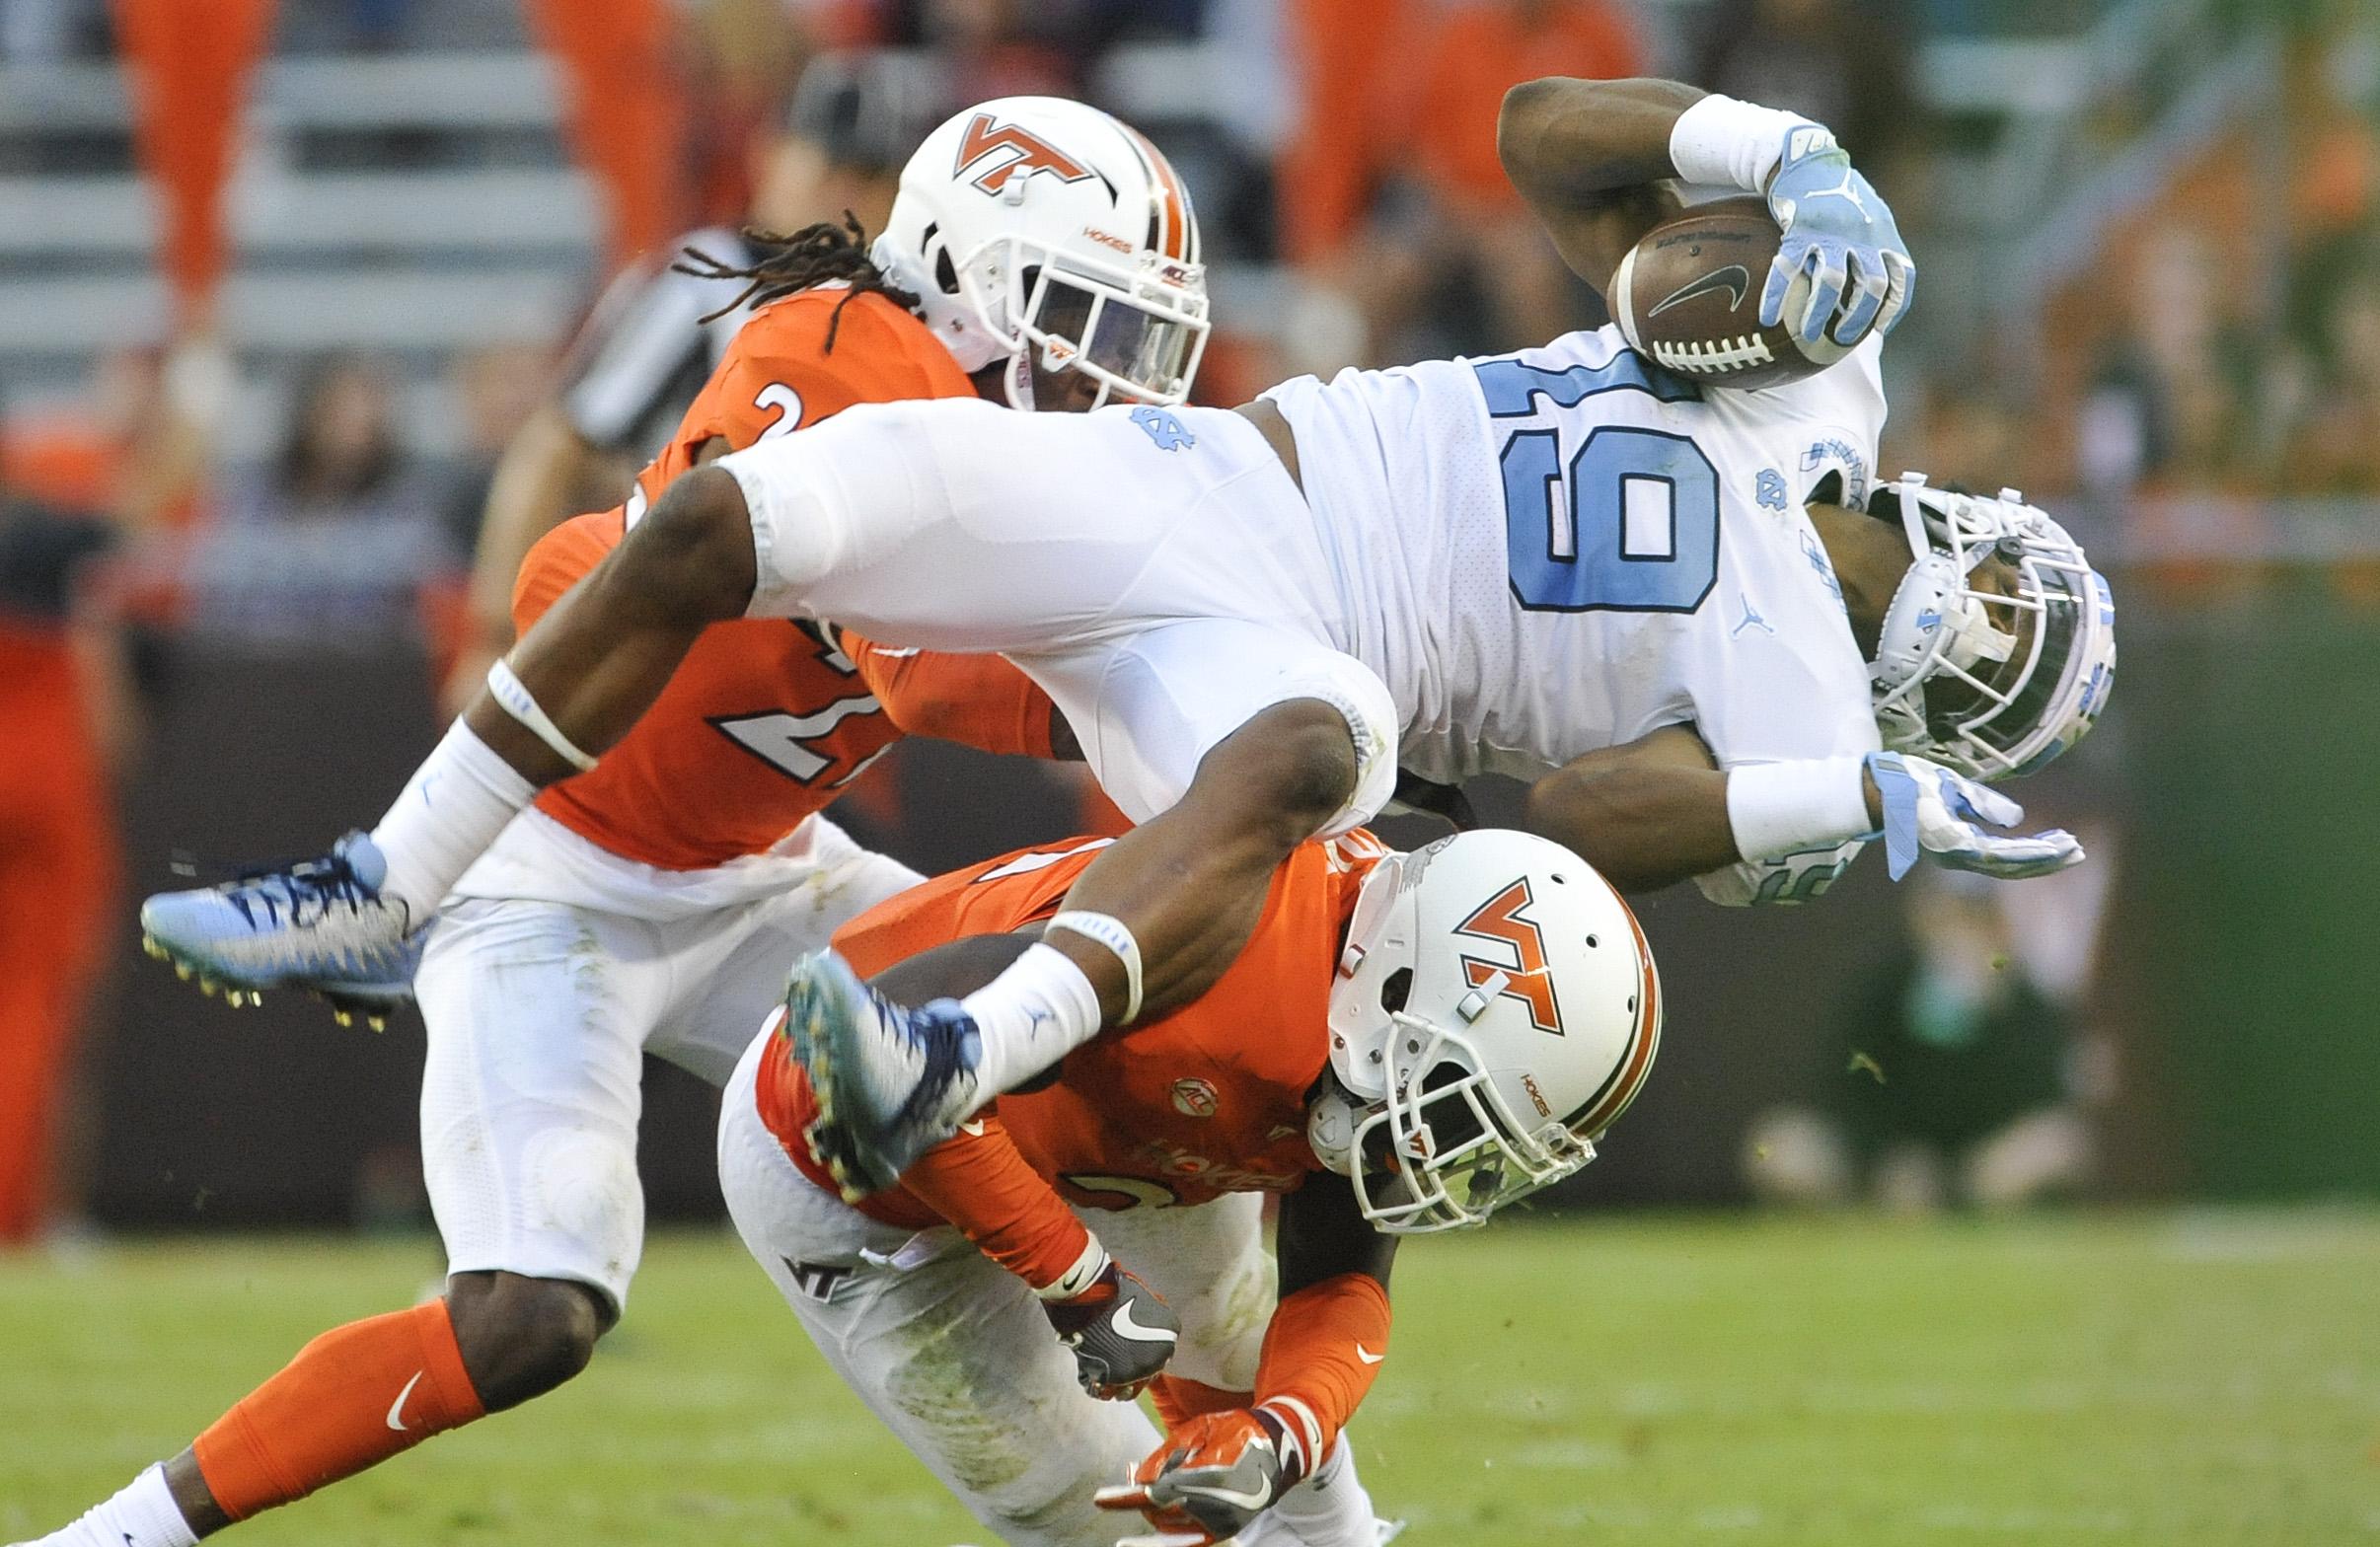 UNC Football: Helmet stickers vs Virginia Tech Hokies